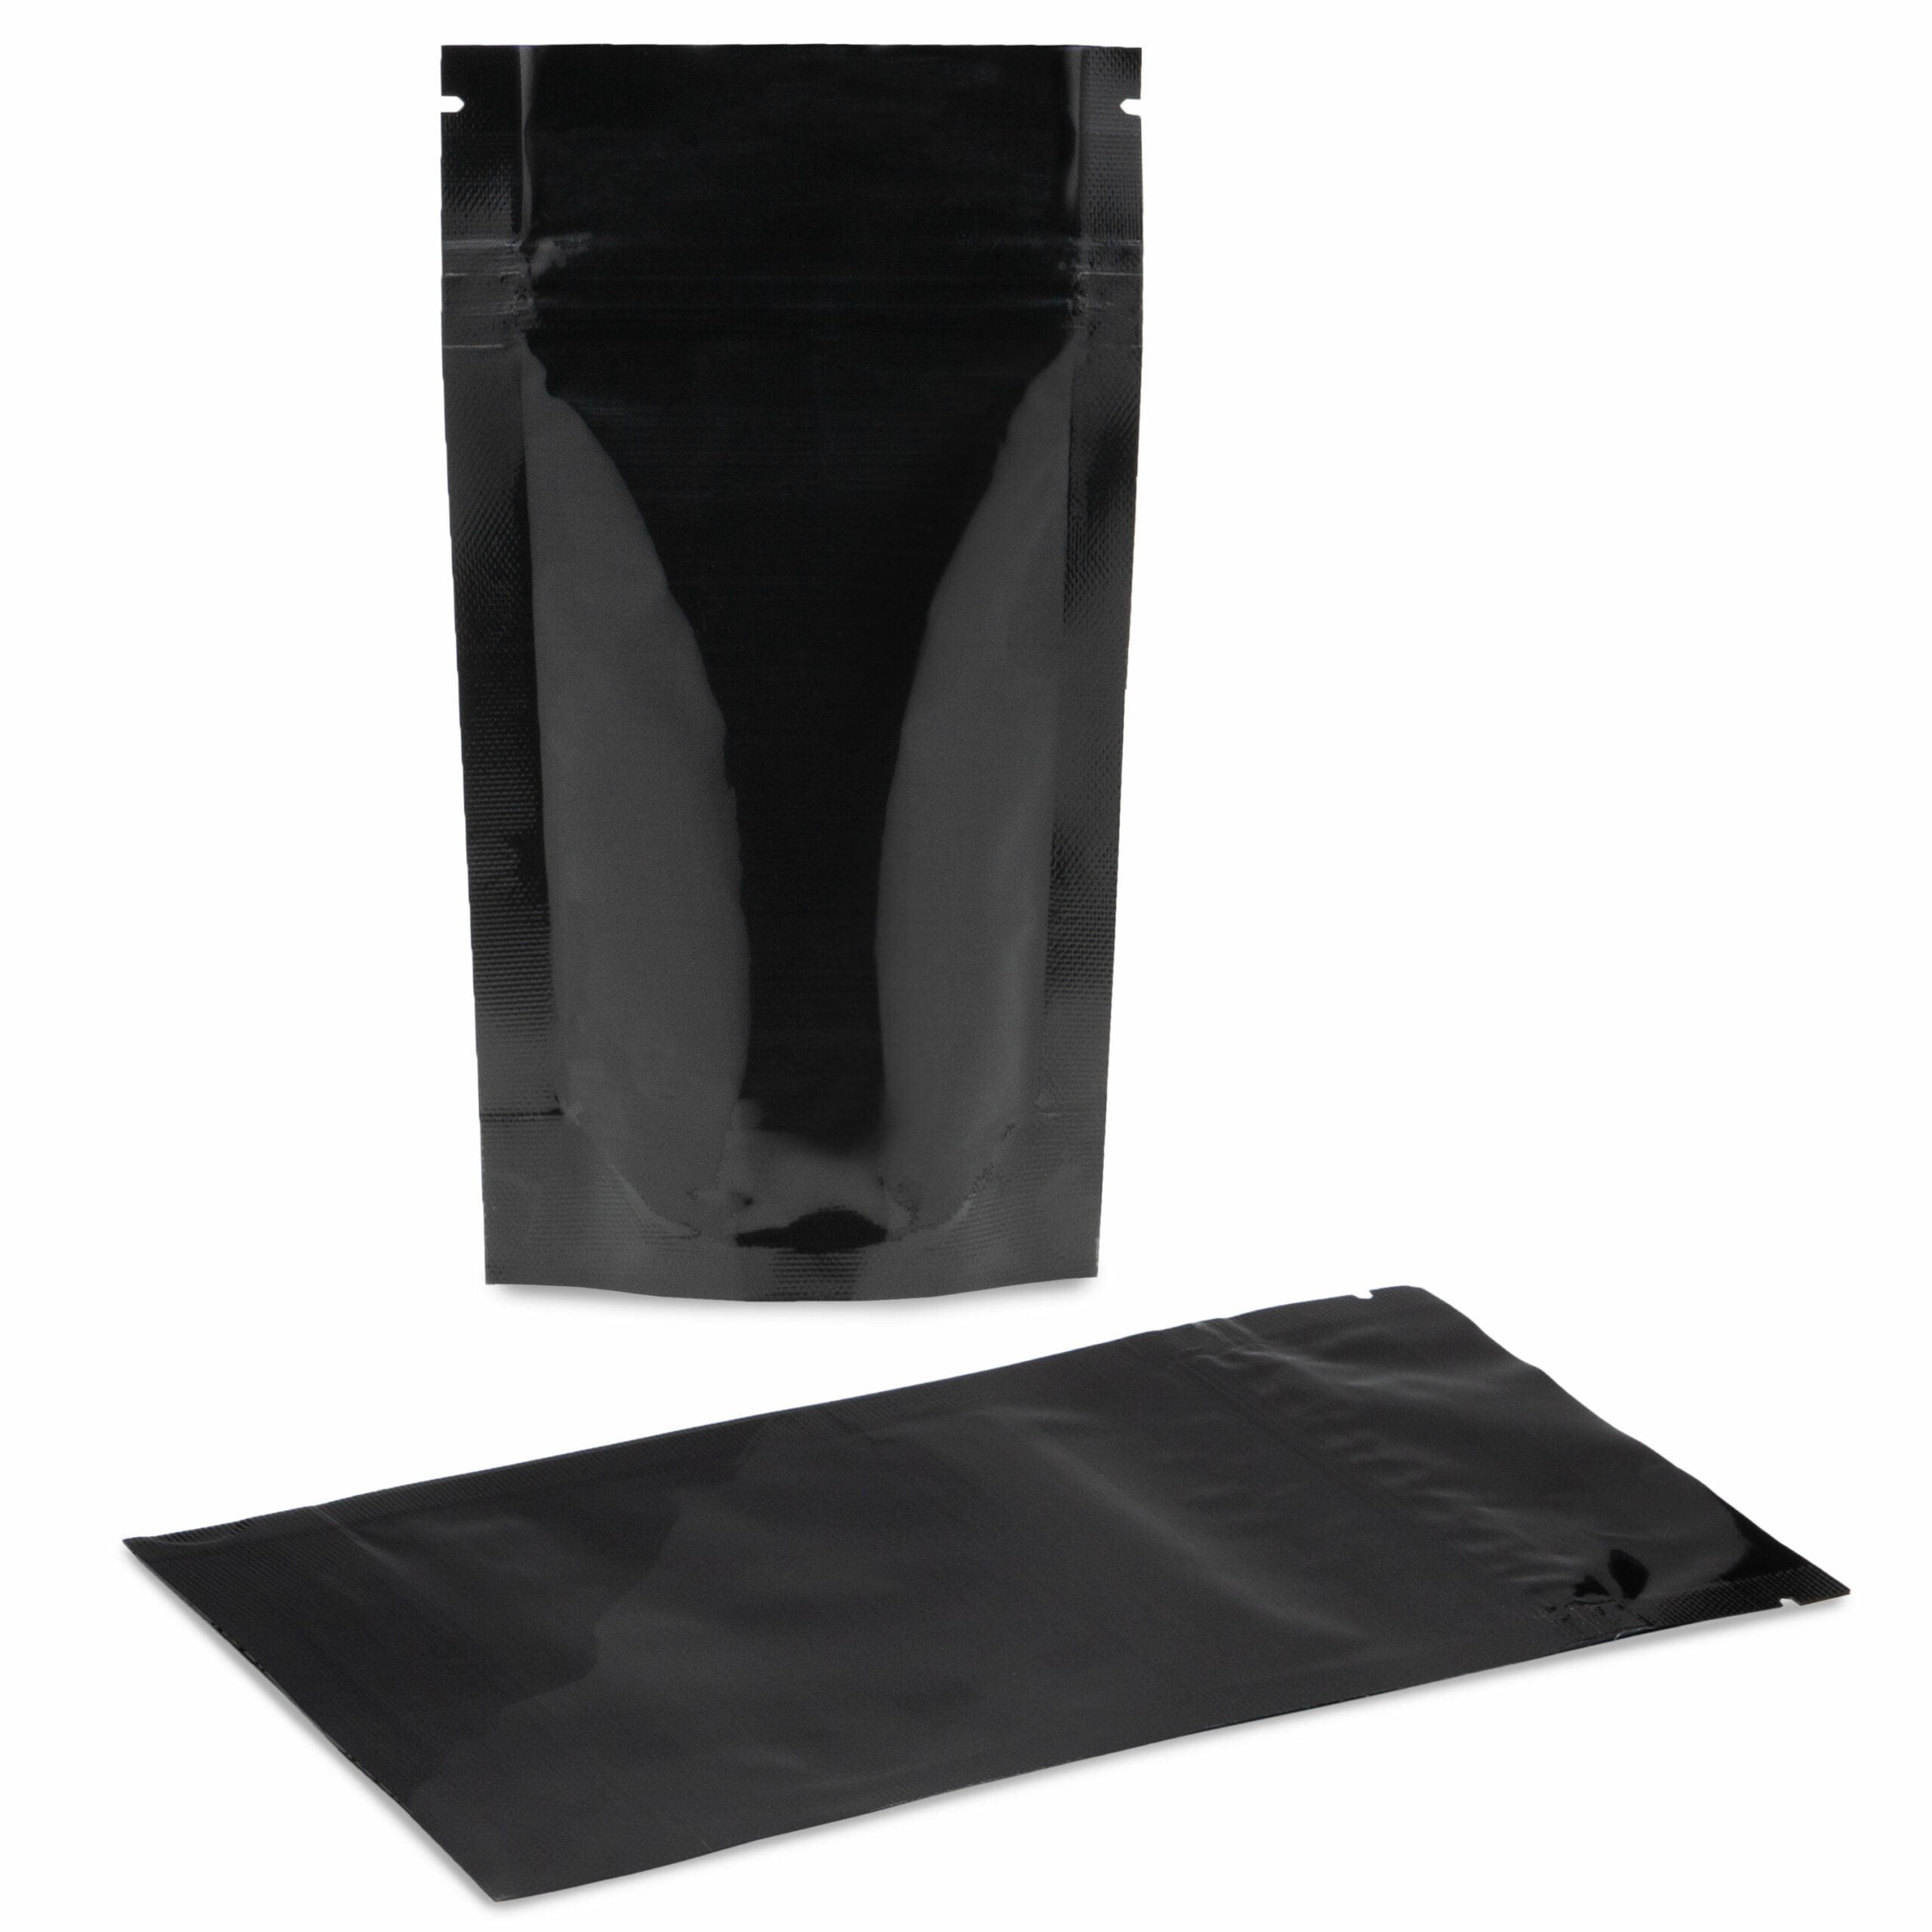 CareBlack Child Resistant 4×7.25×2 (1/4 oz) – 100 Pack